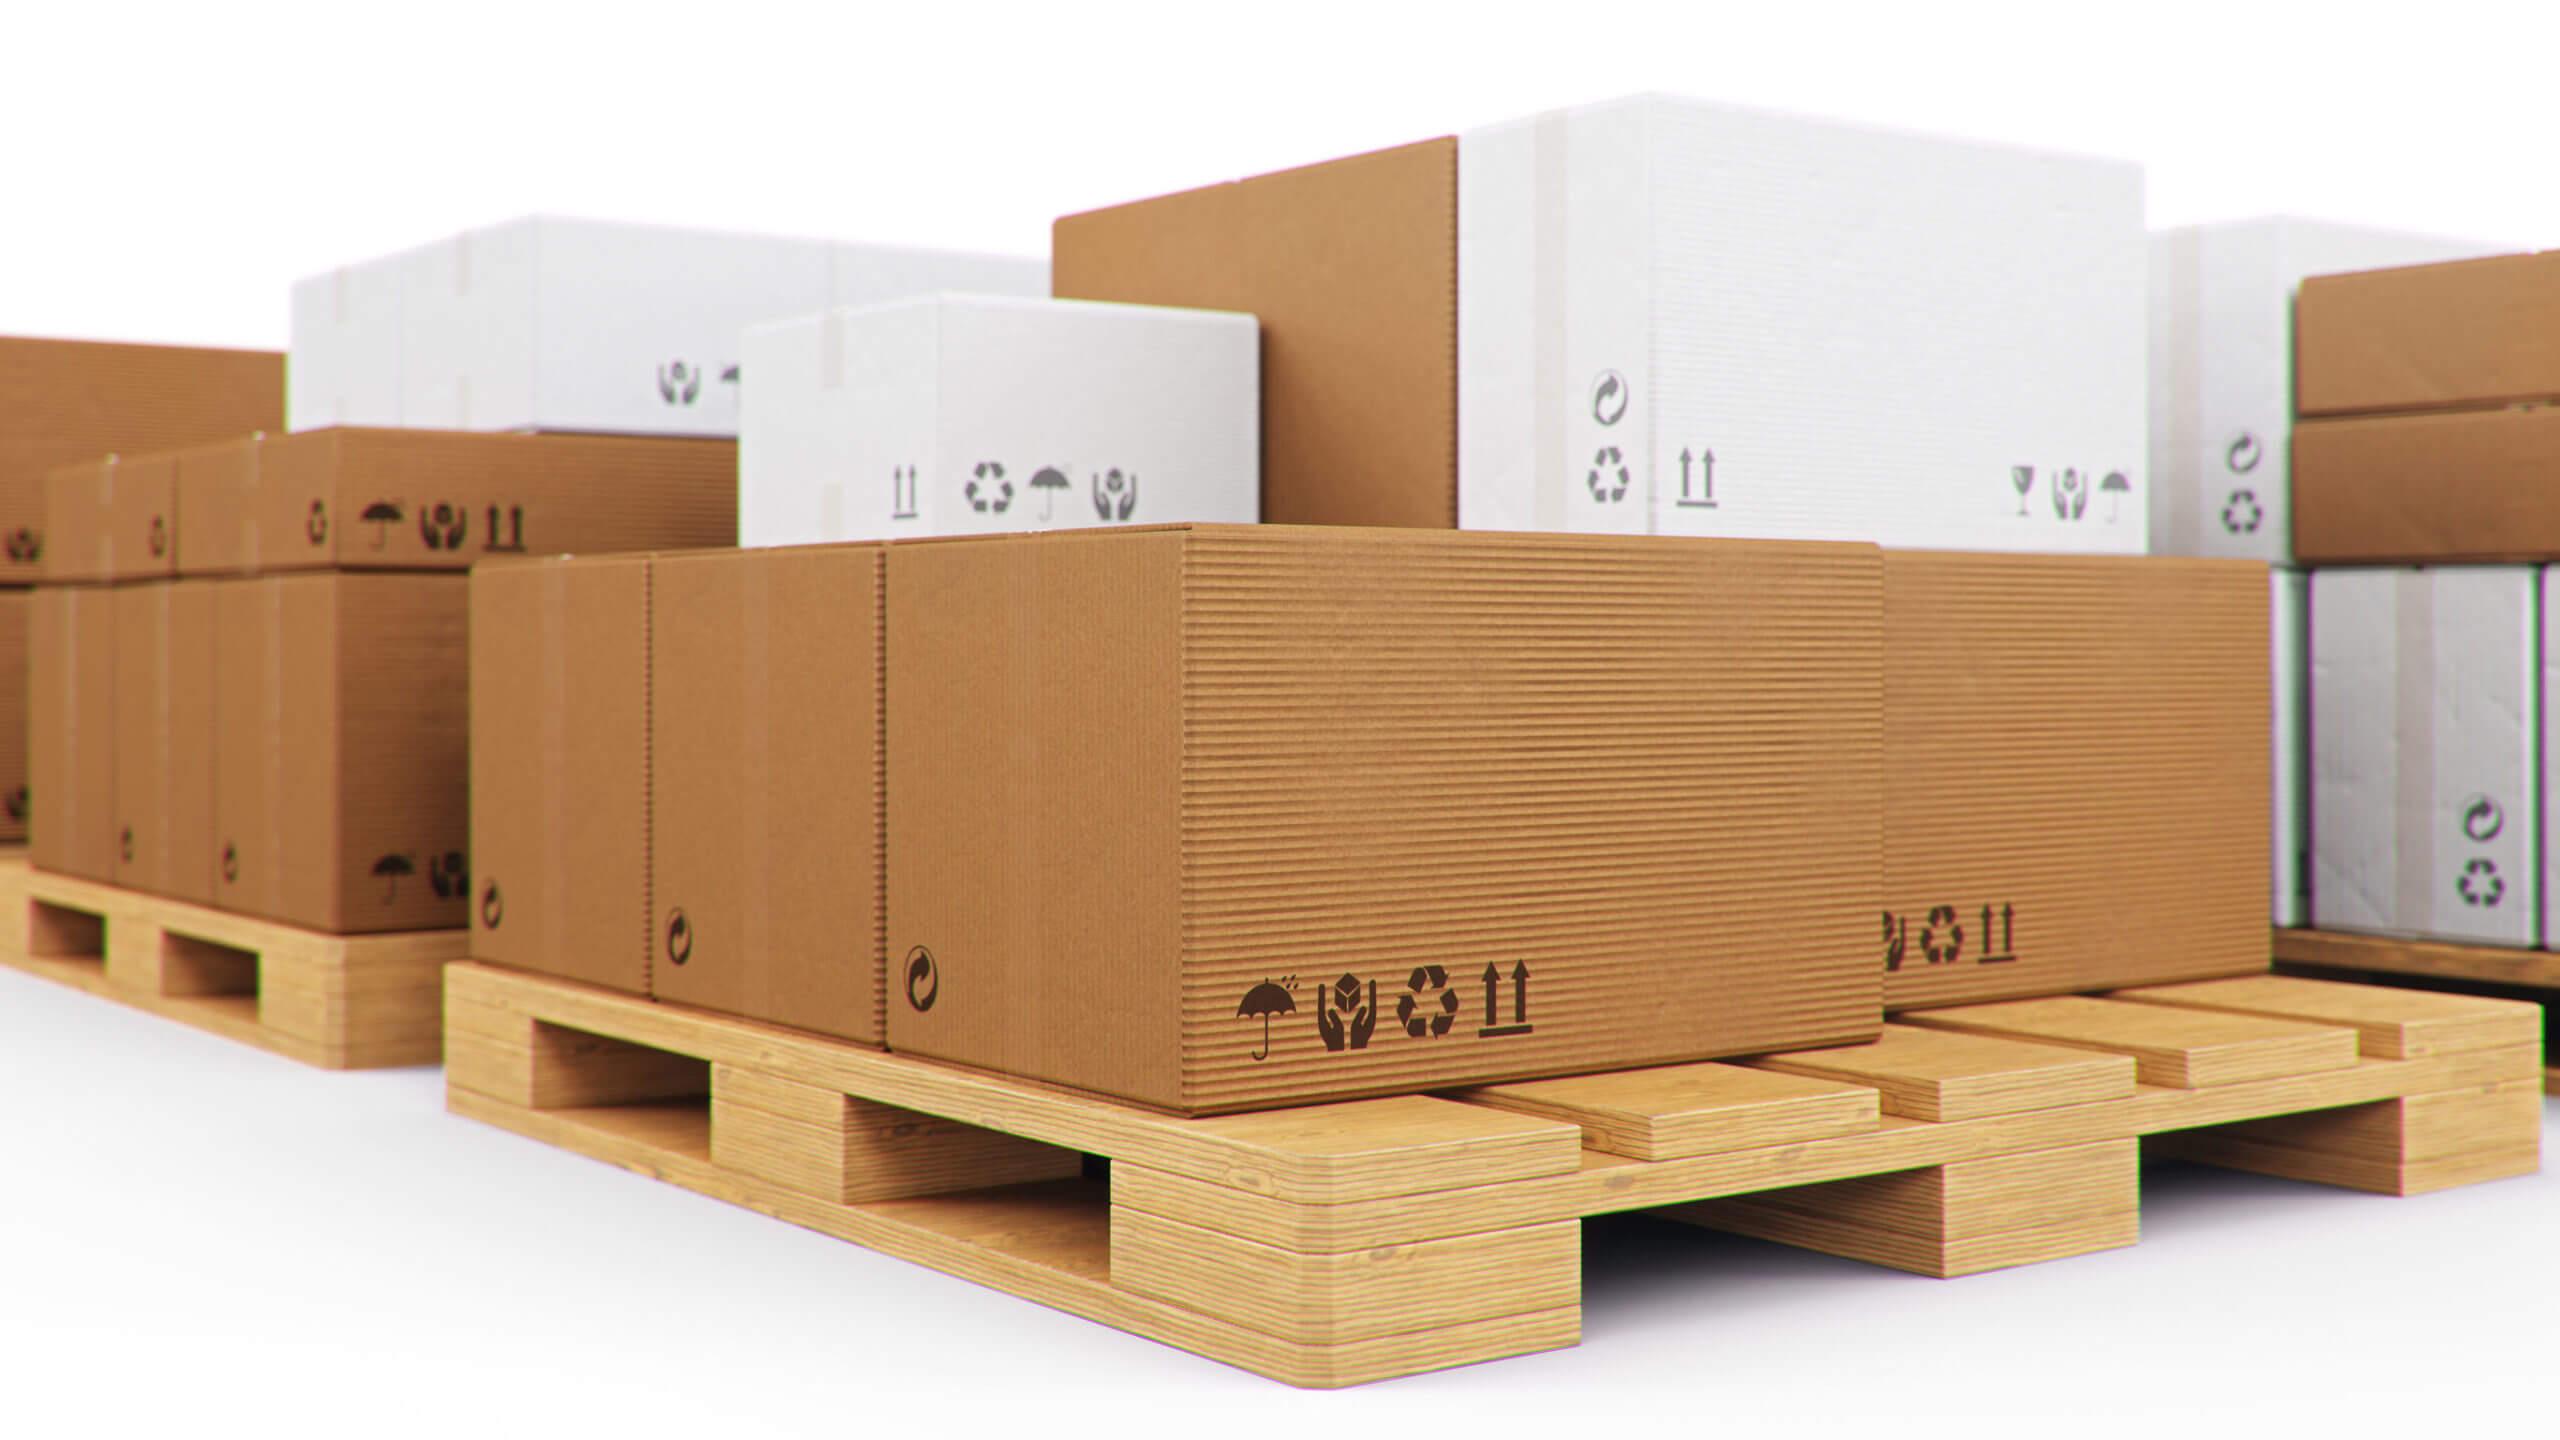 Palettenkartons und Containerkartons